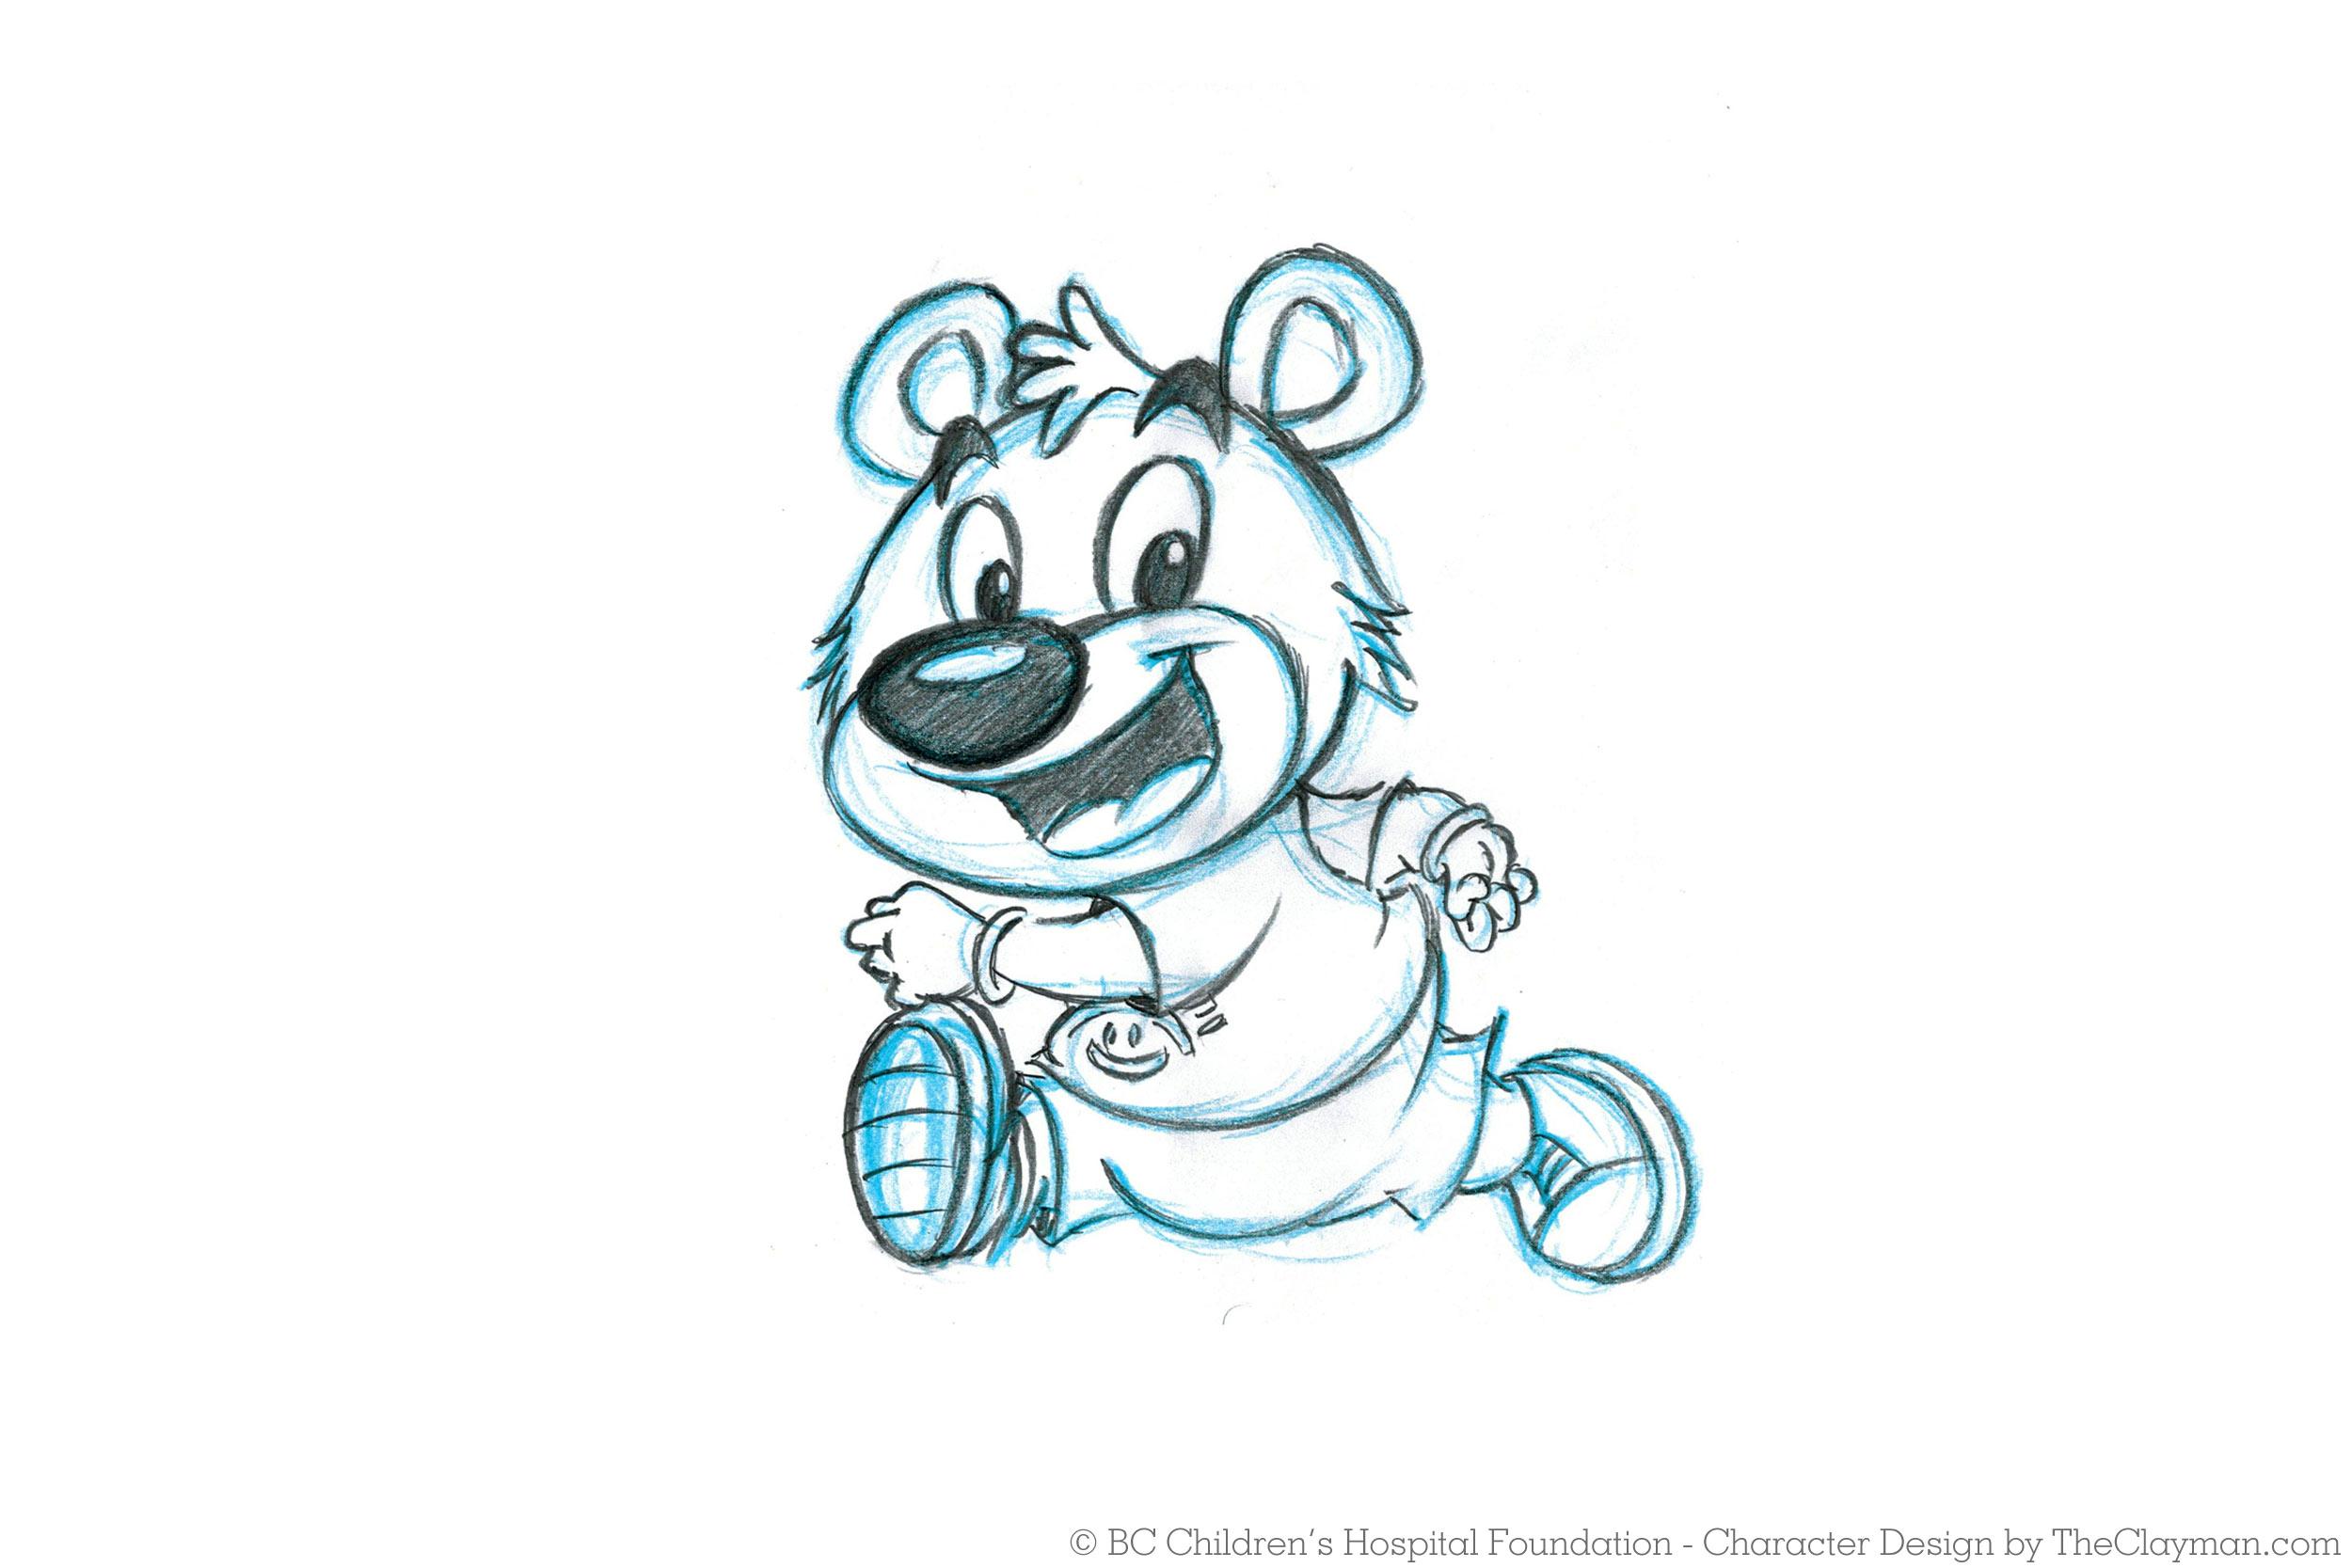 Character Design And Development : Cartoon character design development the clayman d